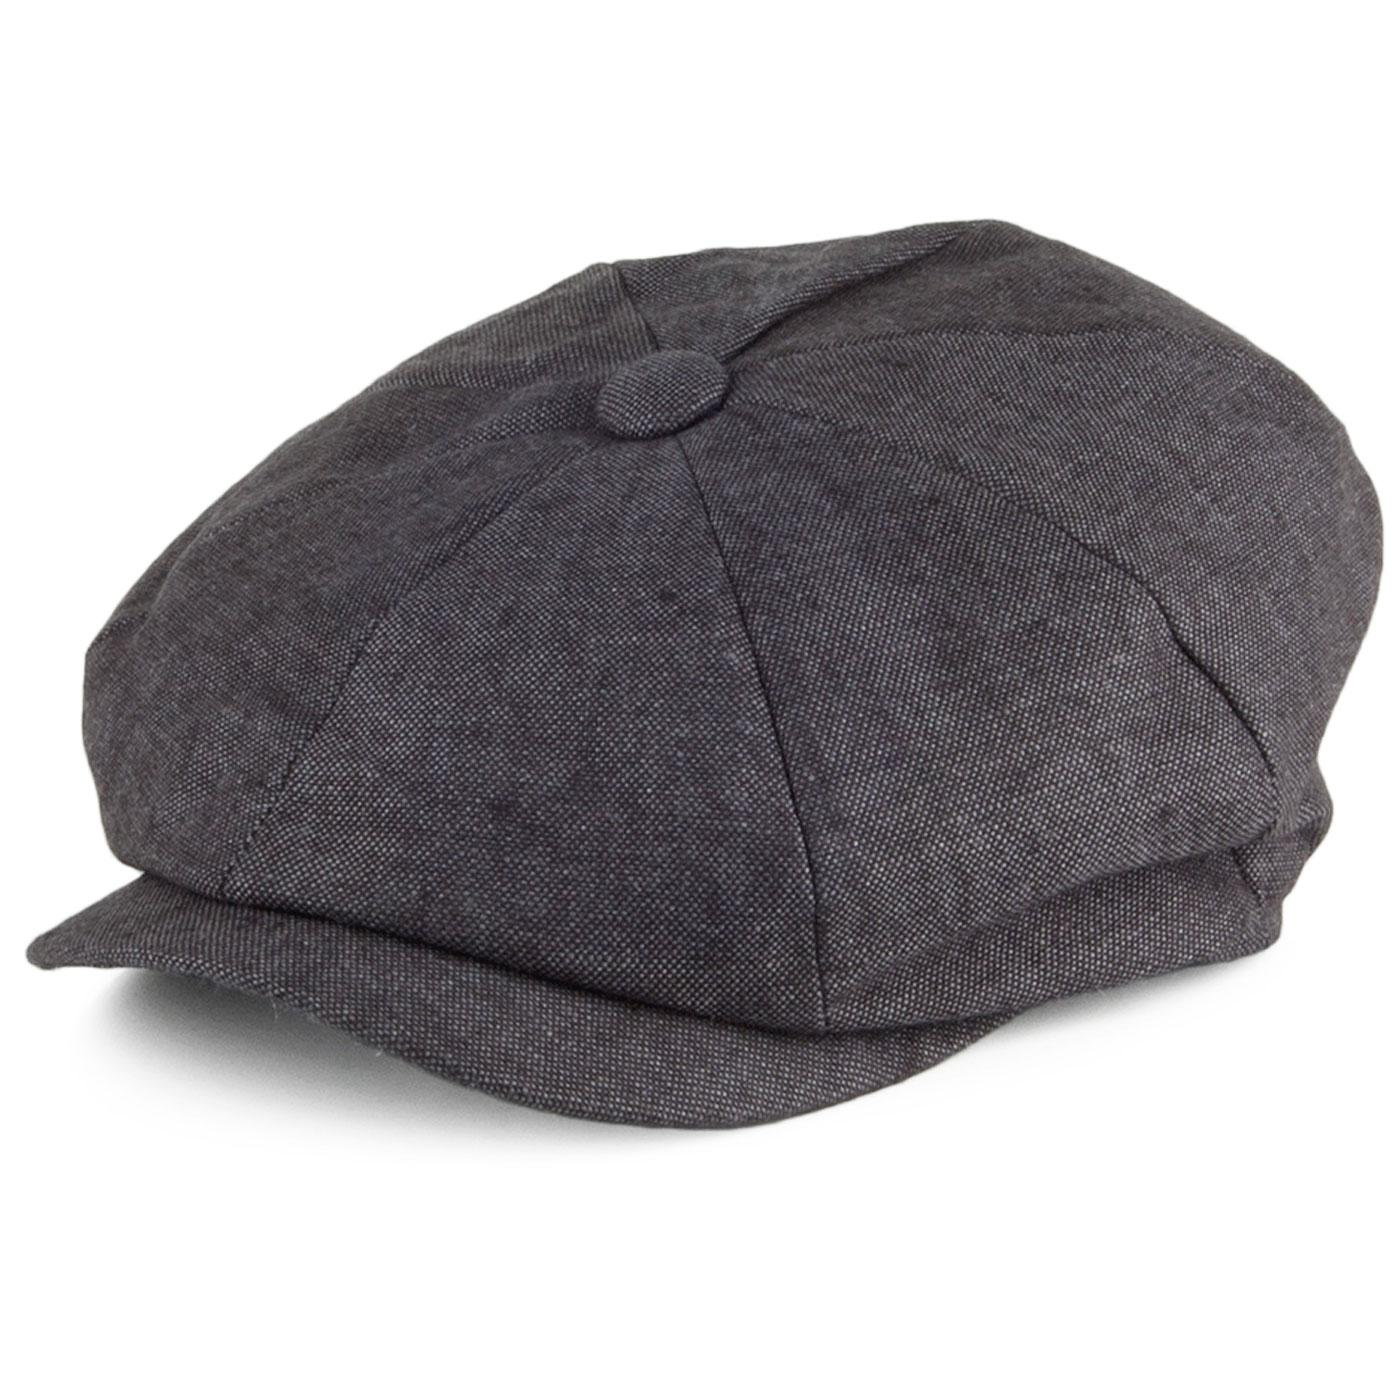 FAILSWORTH Retro Irish Linen Gatsby Hat (Charcoal)